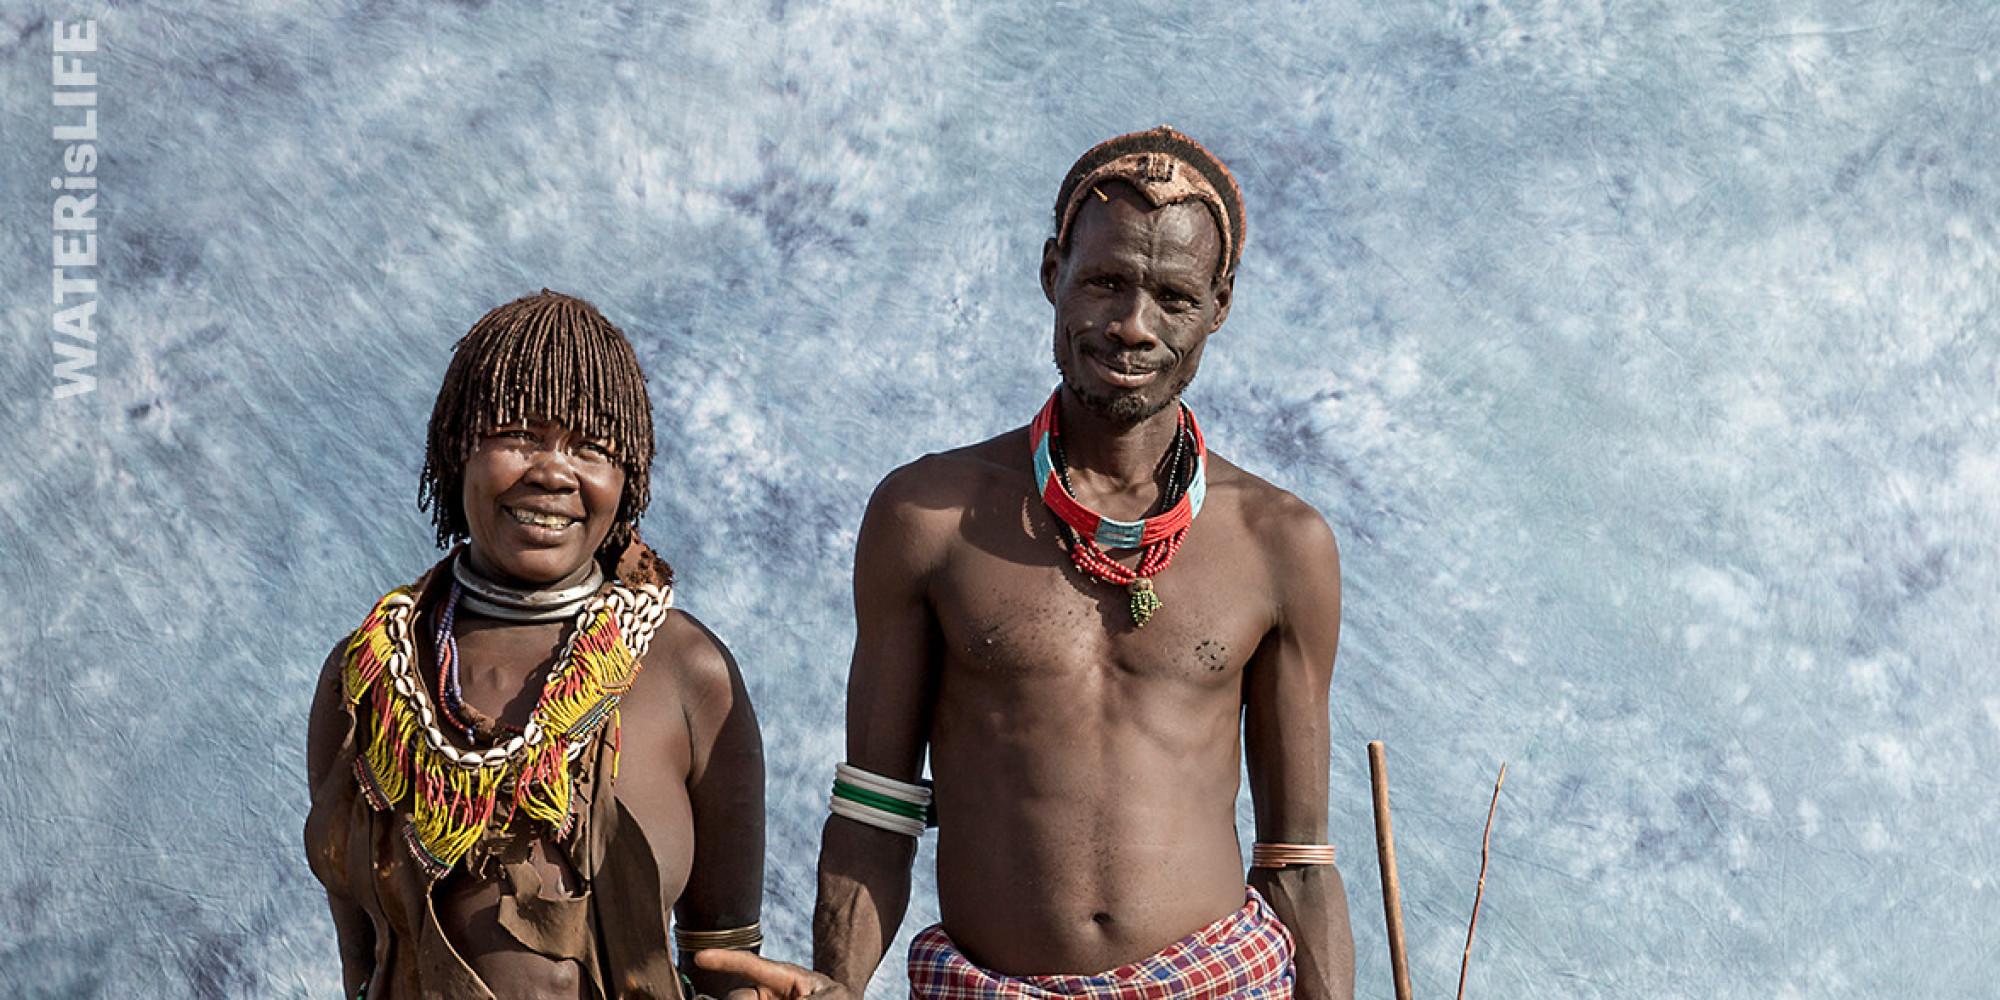 Families In Ethiopia Pose For Sears-Style Photos To Raise